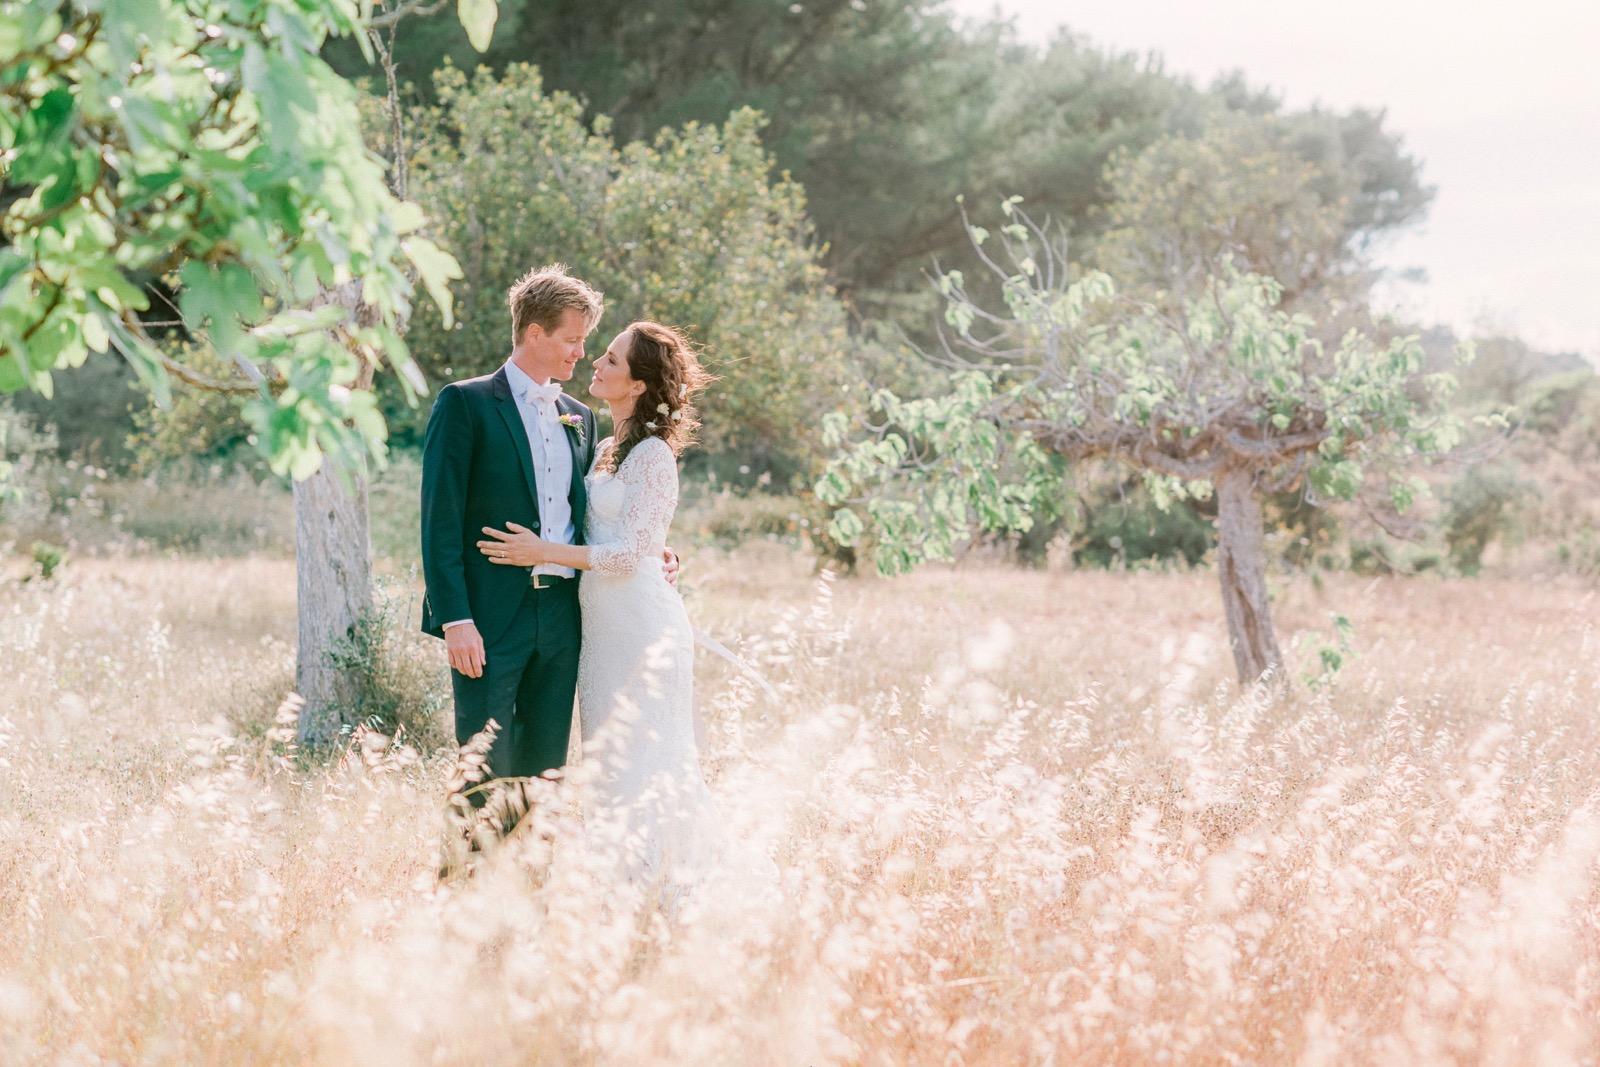 https://www.white-ibiza.com/wp-content/uploads/2020/03/ibiza-weddings-tamas-kooning-lansbergen-2019-01.jpg